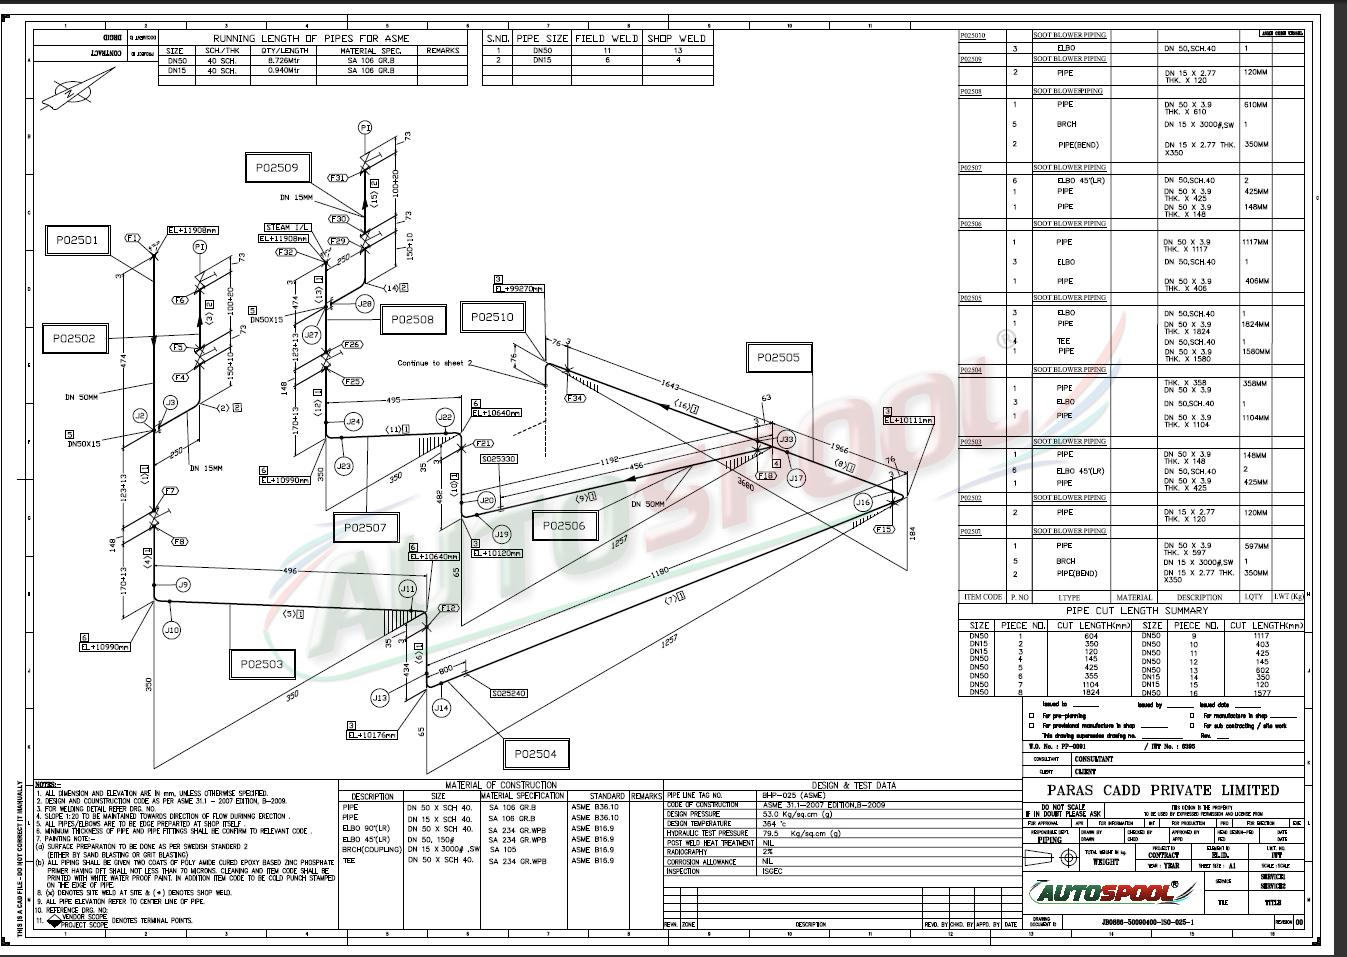 autospool sample output